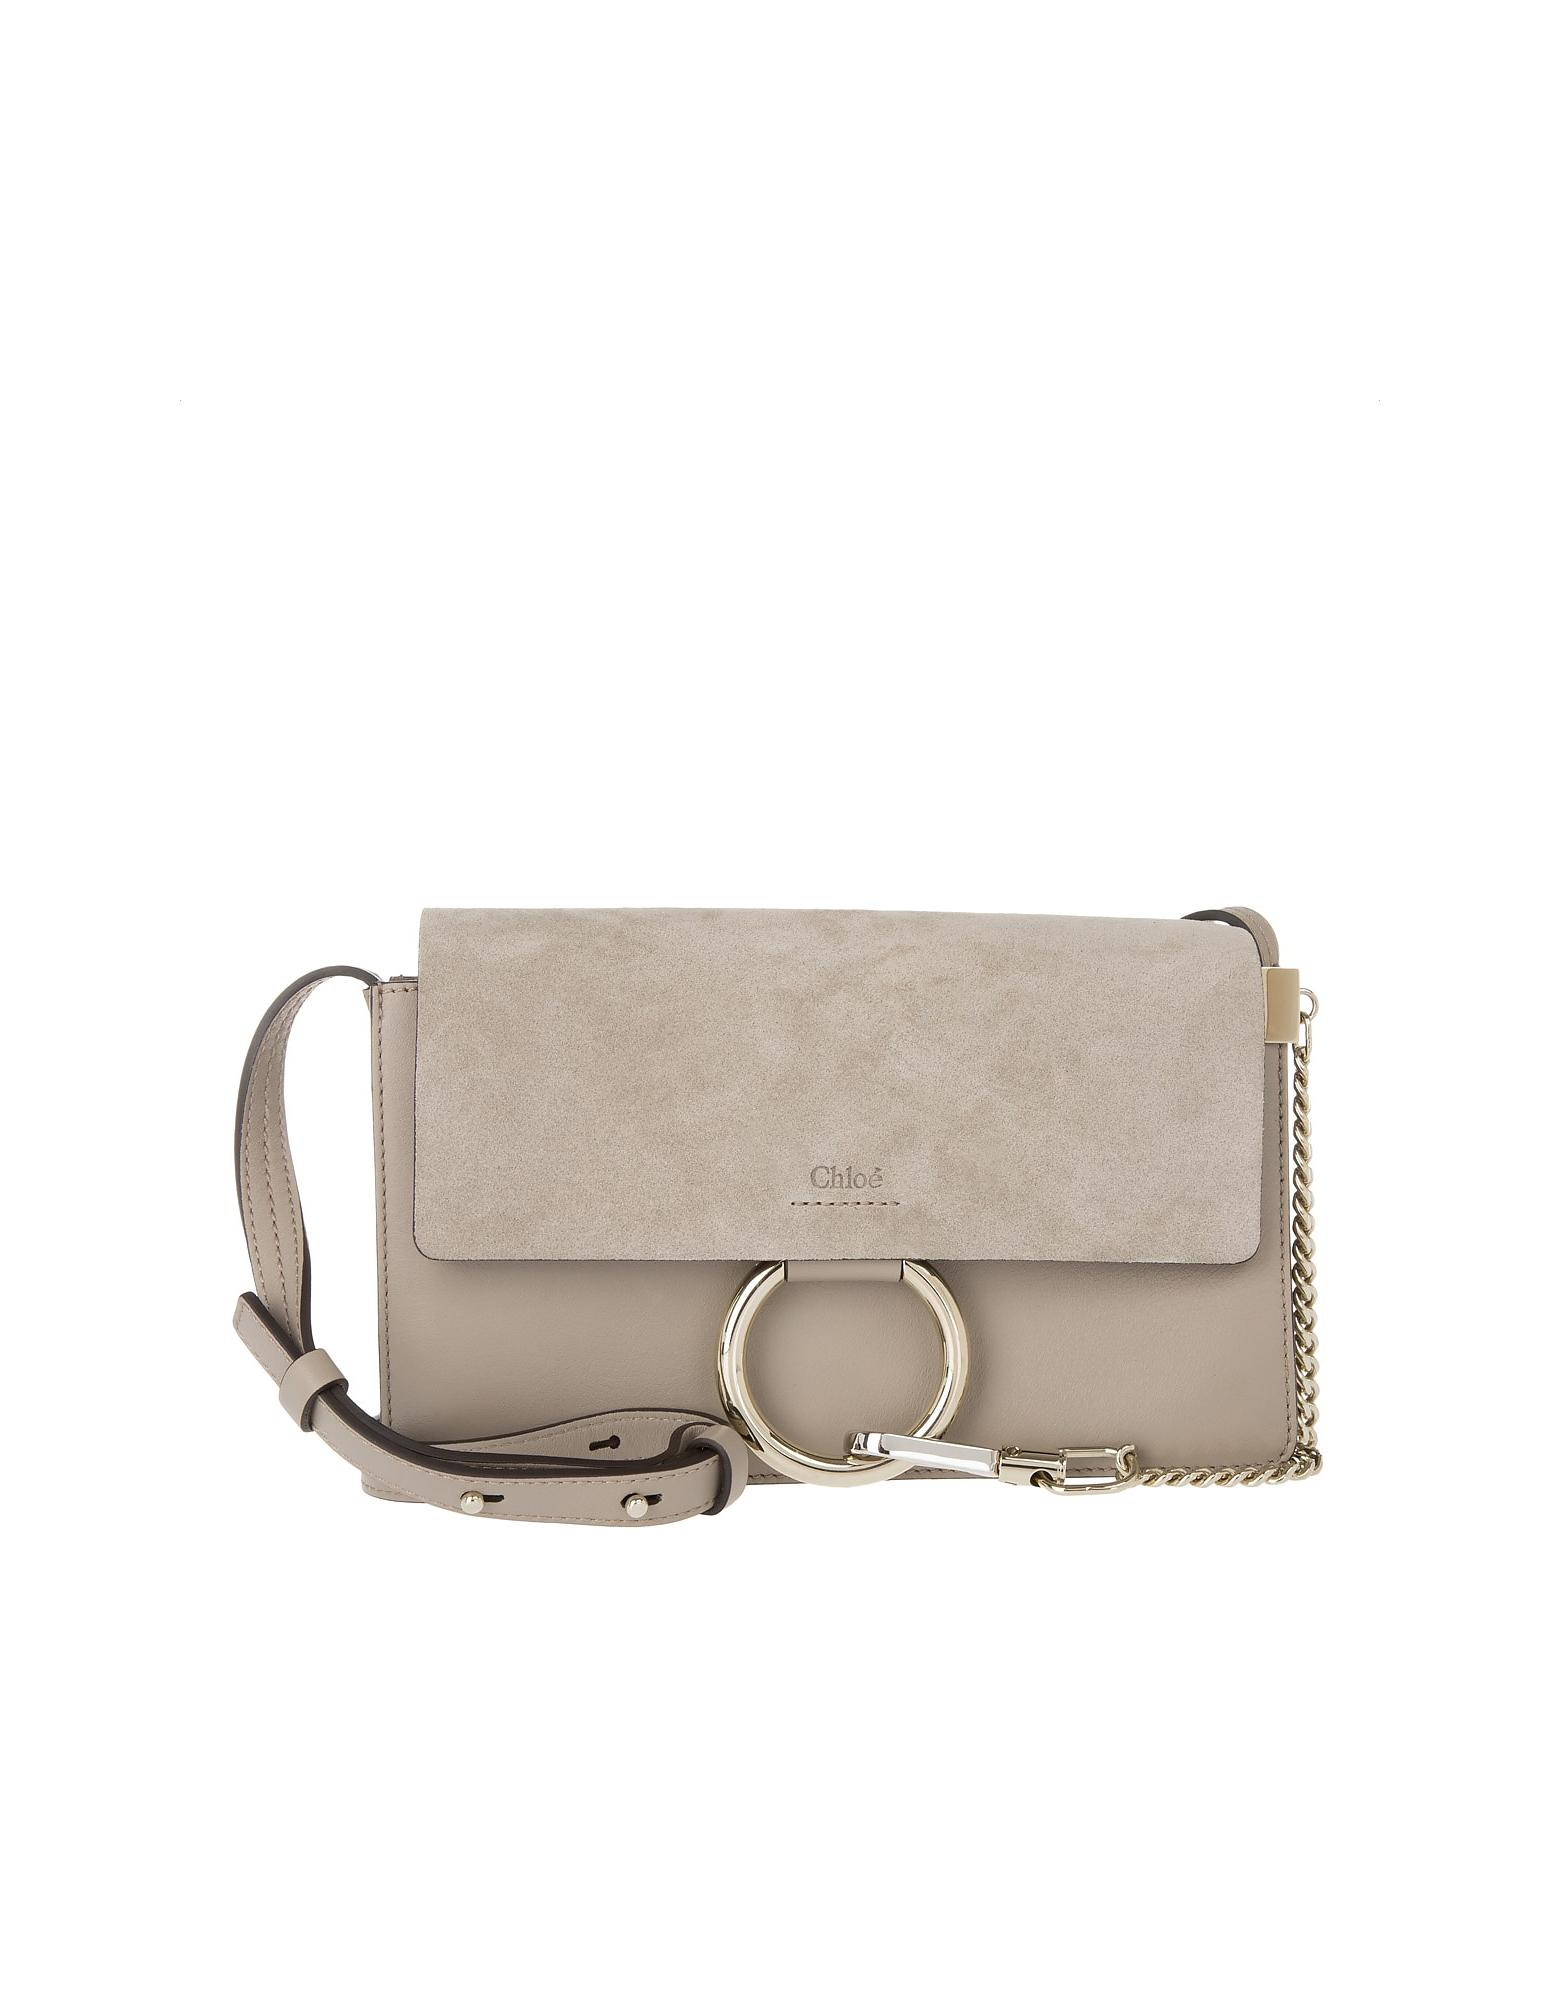 9cac9714b52c Chloé Faye Small Shoulder Bag Motty Grey in Gray - Lyst